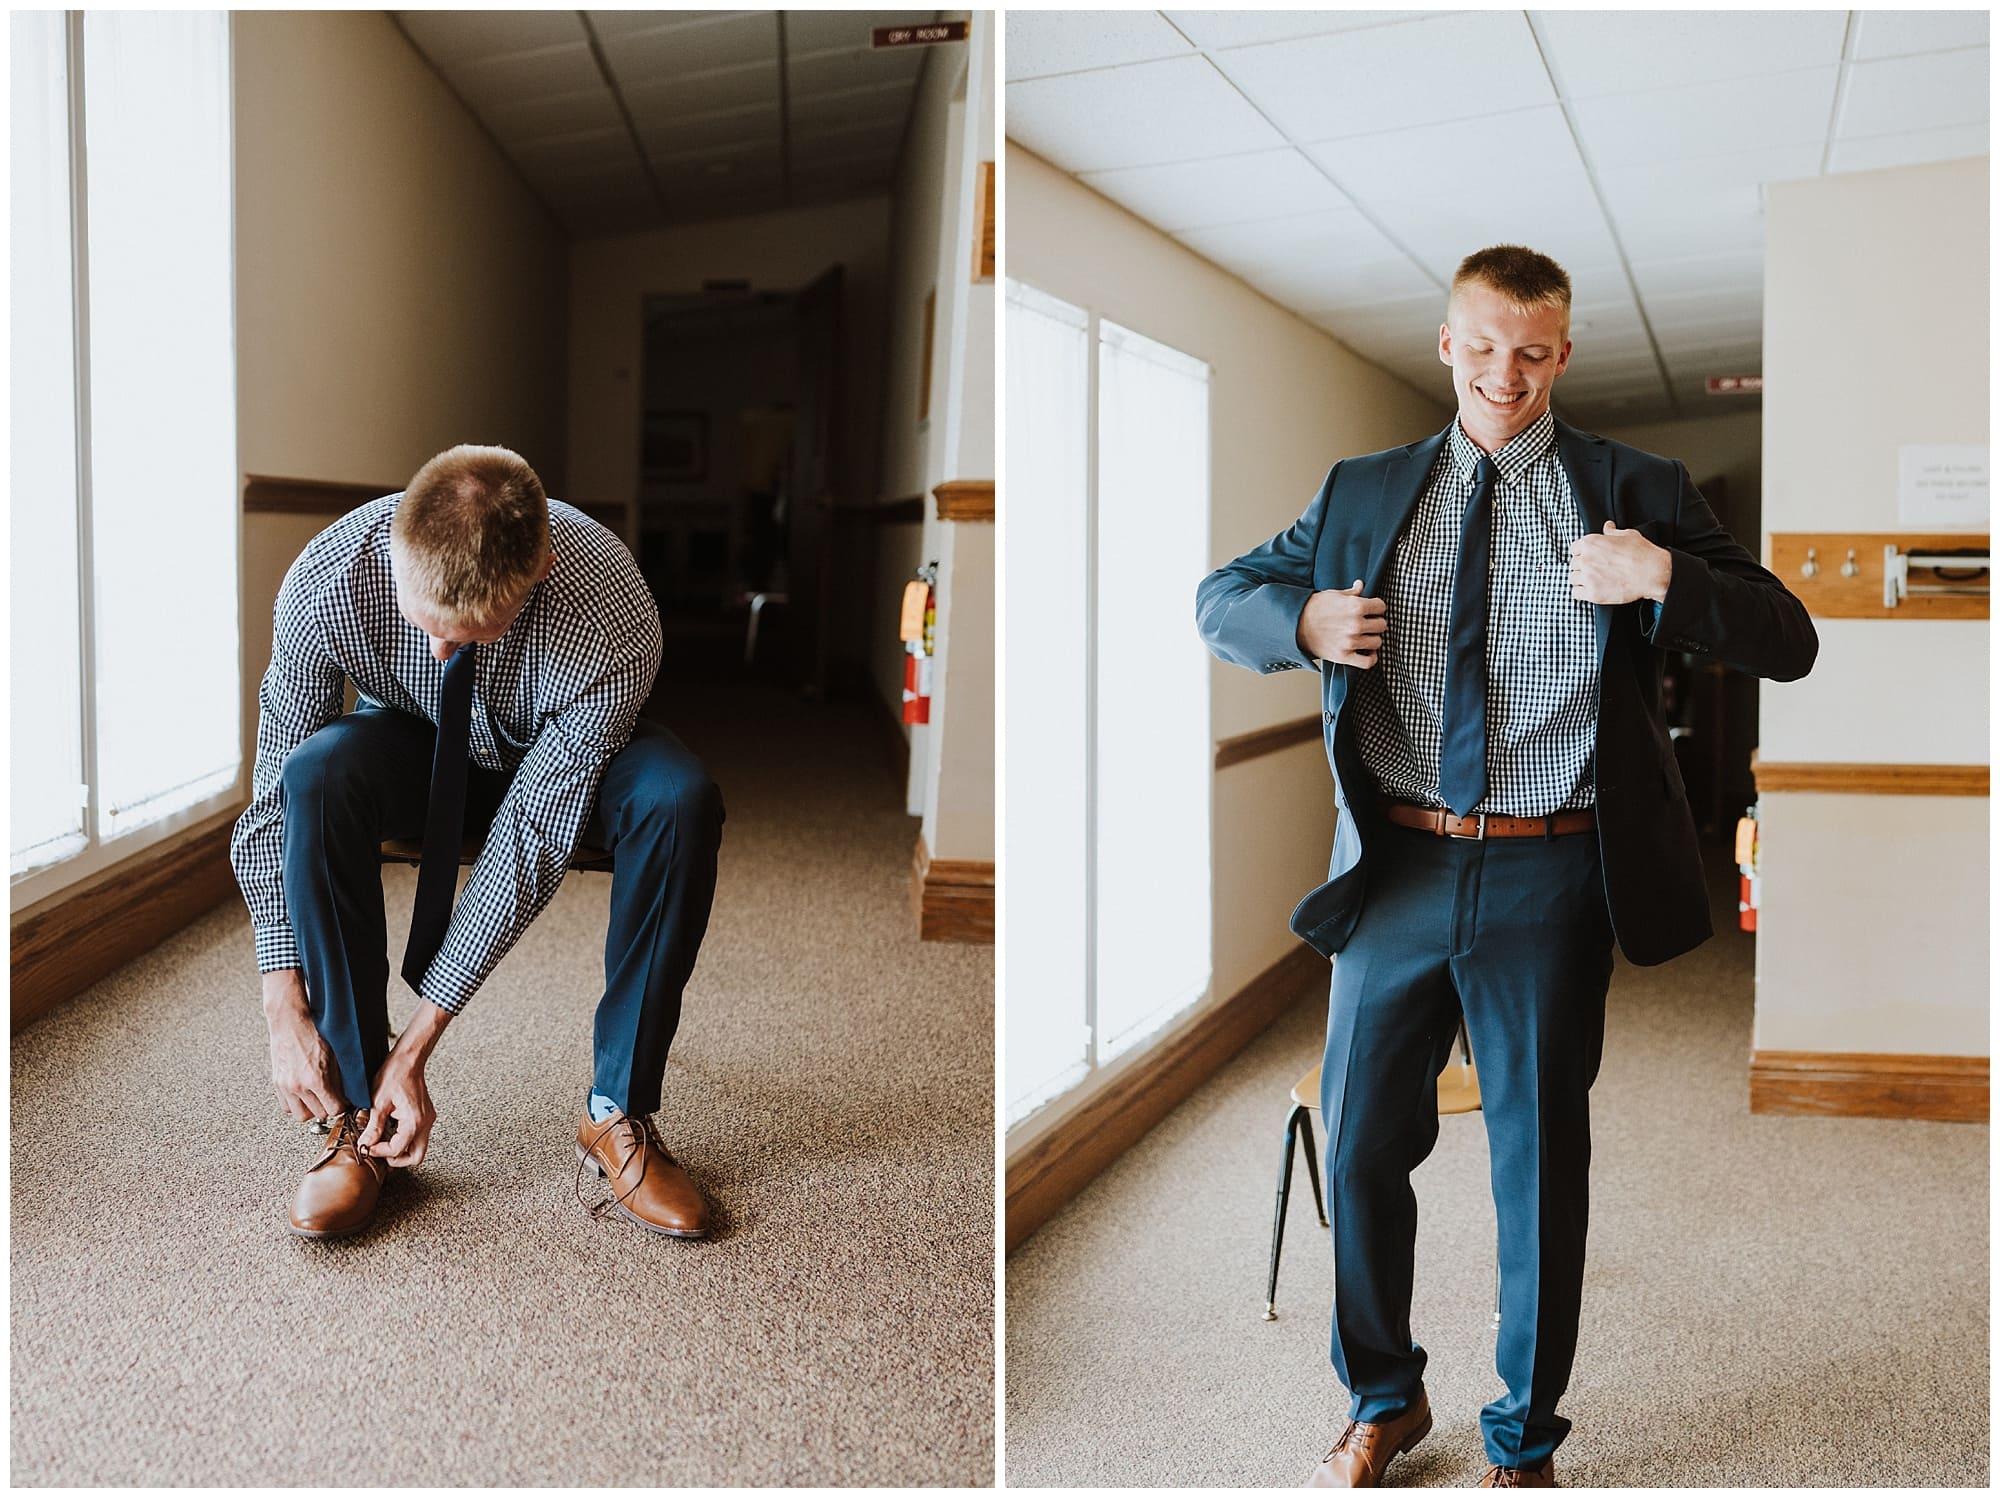 Adrian Michigan Wedding Photographer-5.JPG